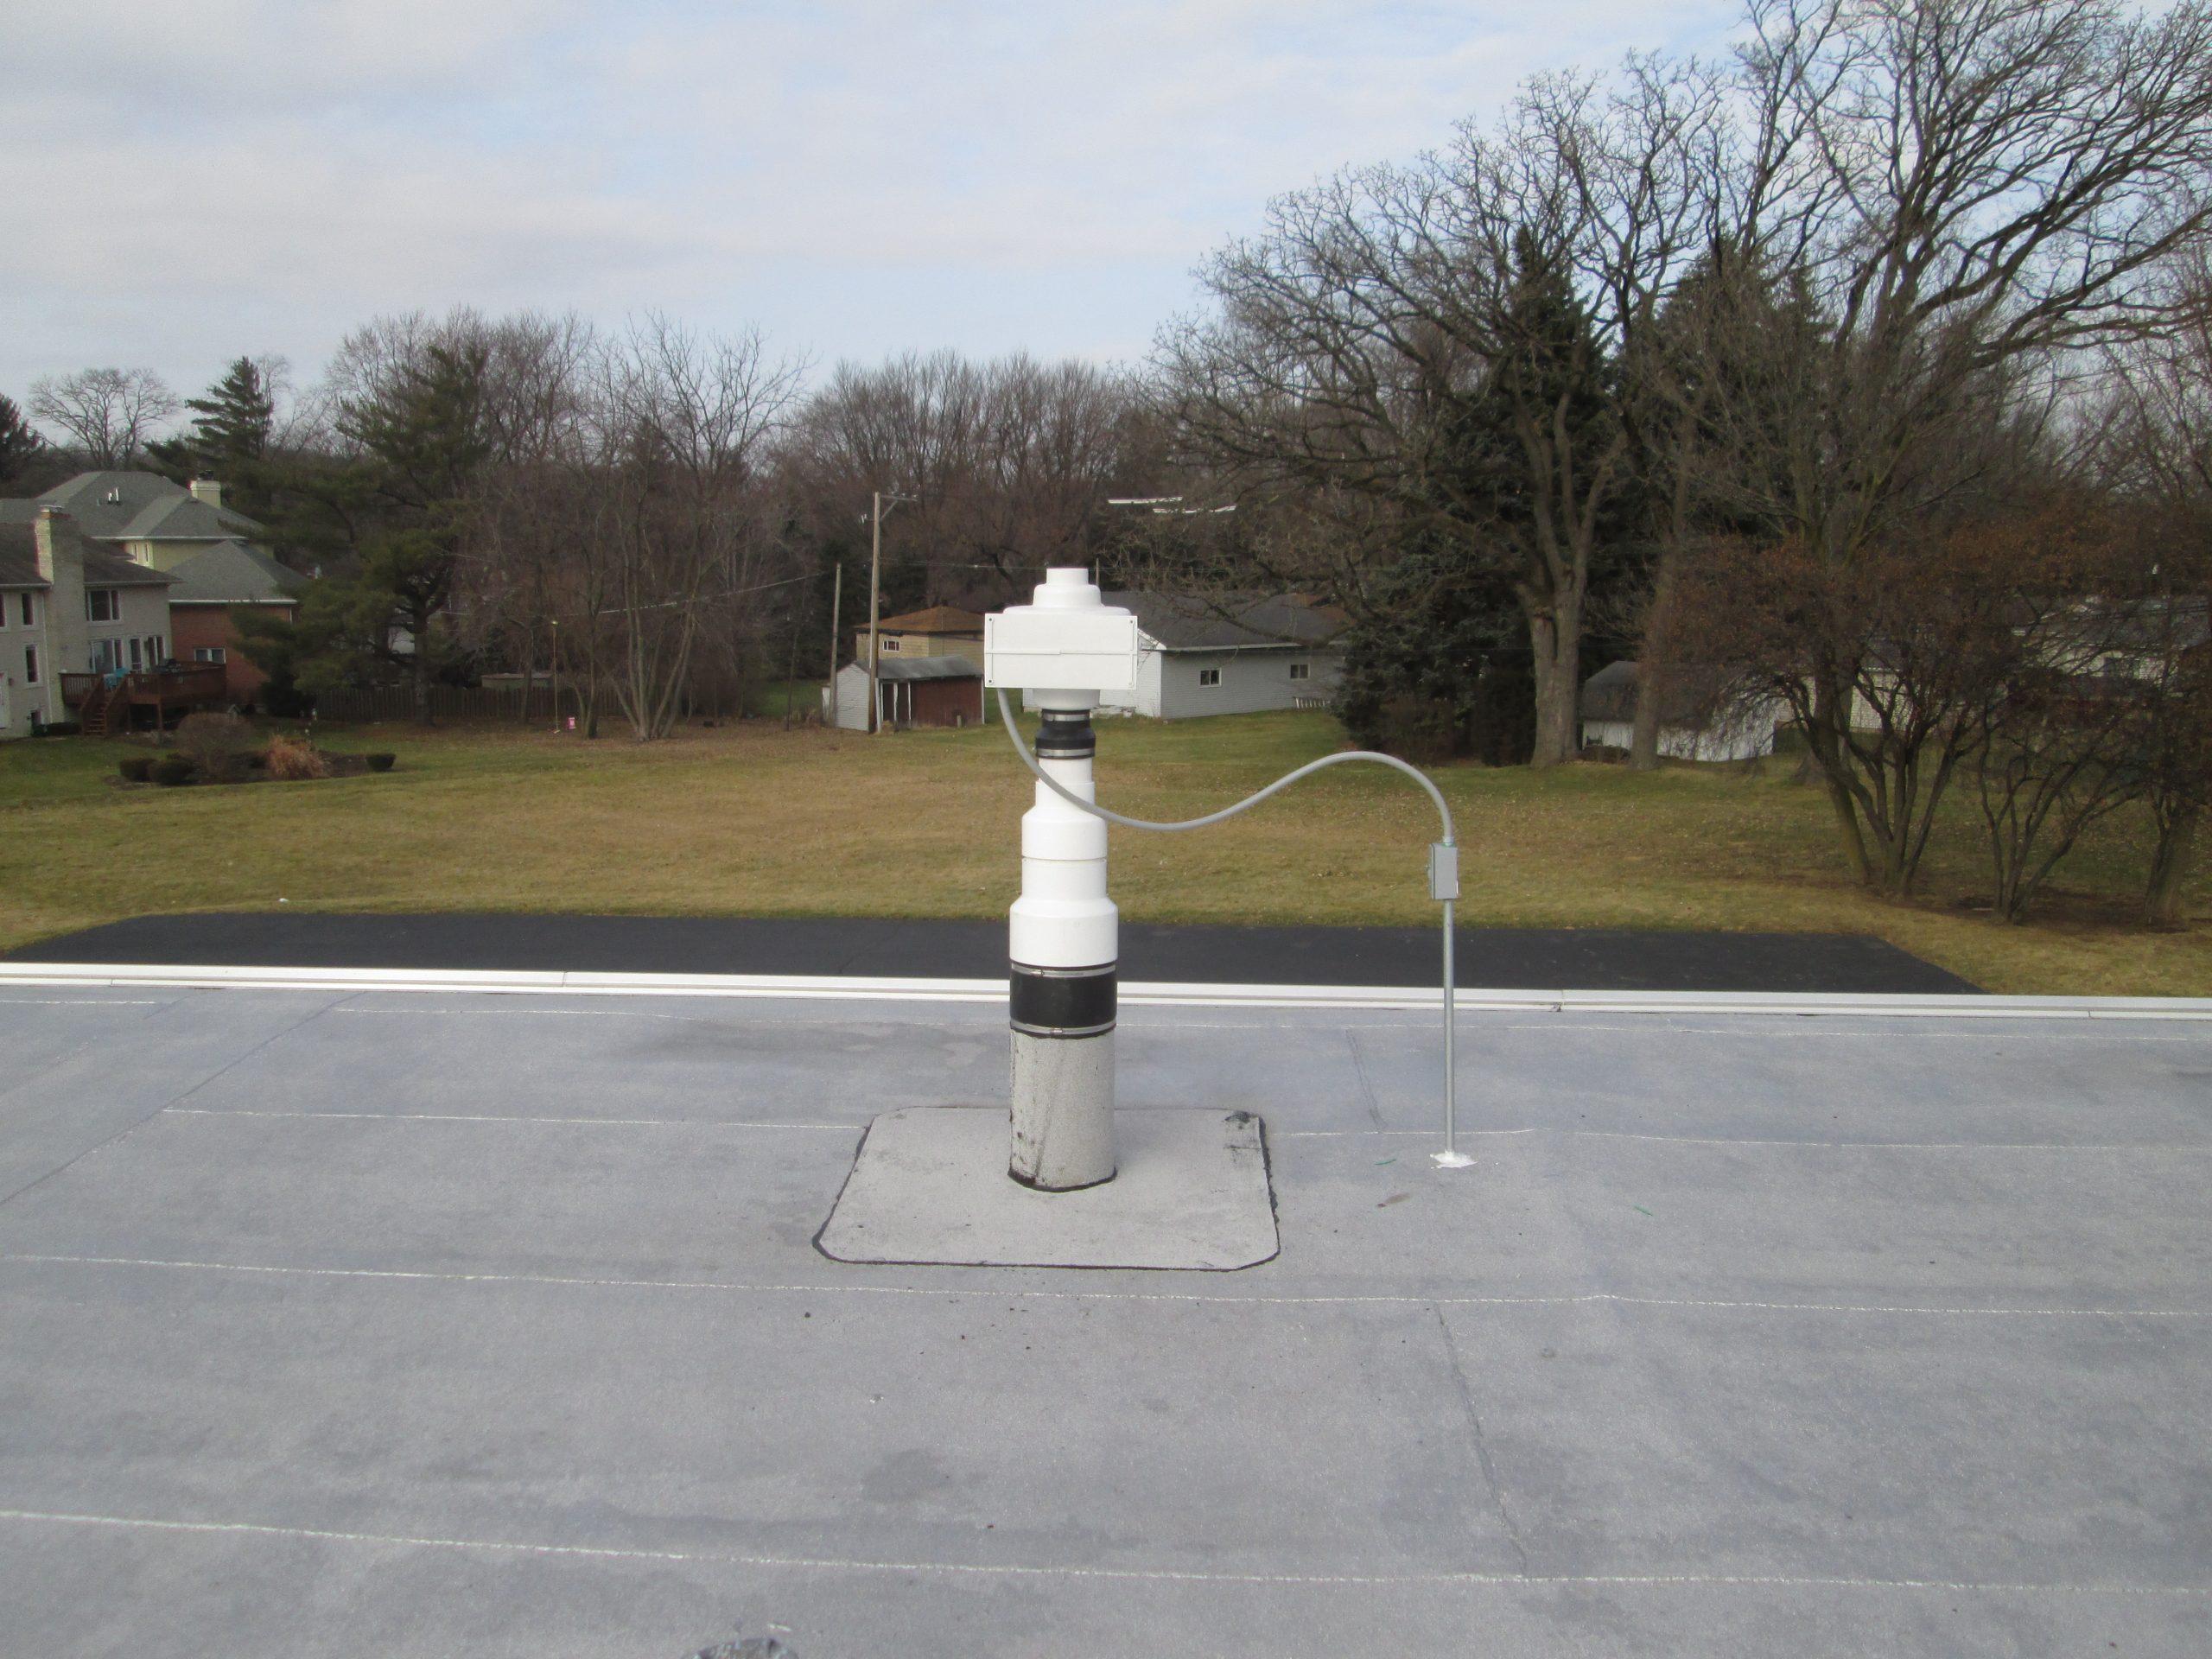 radon-mitigation-system-school-7